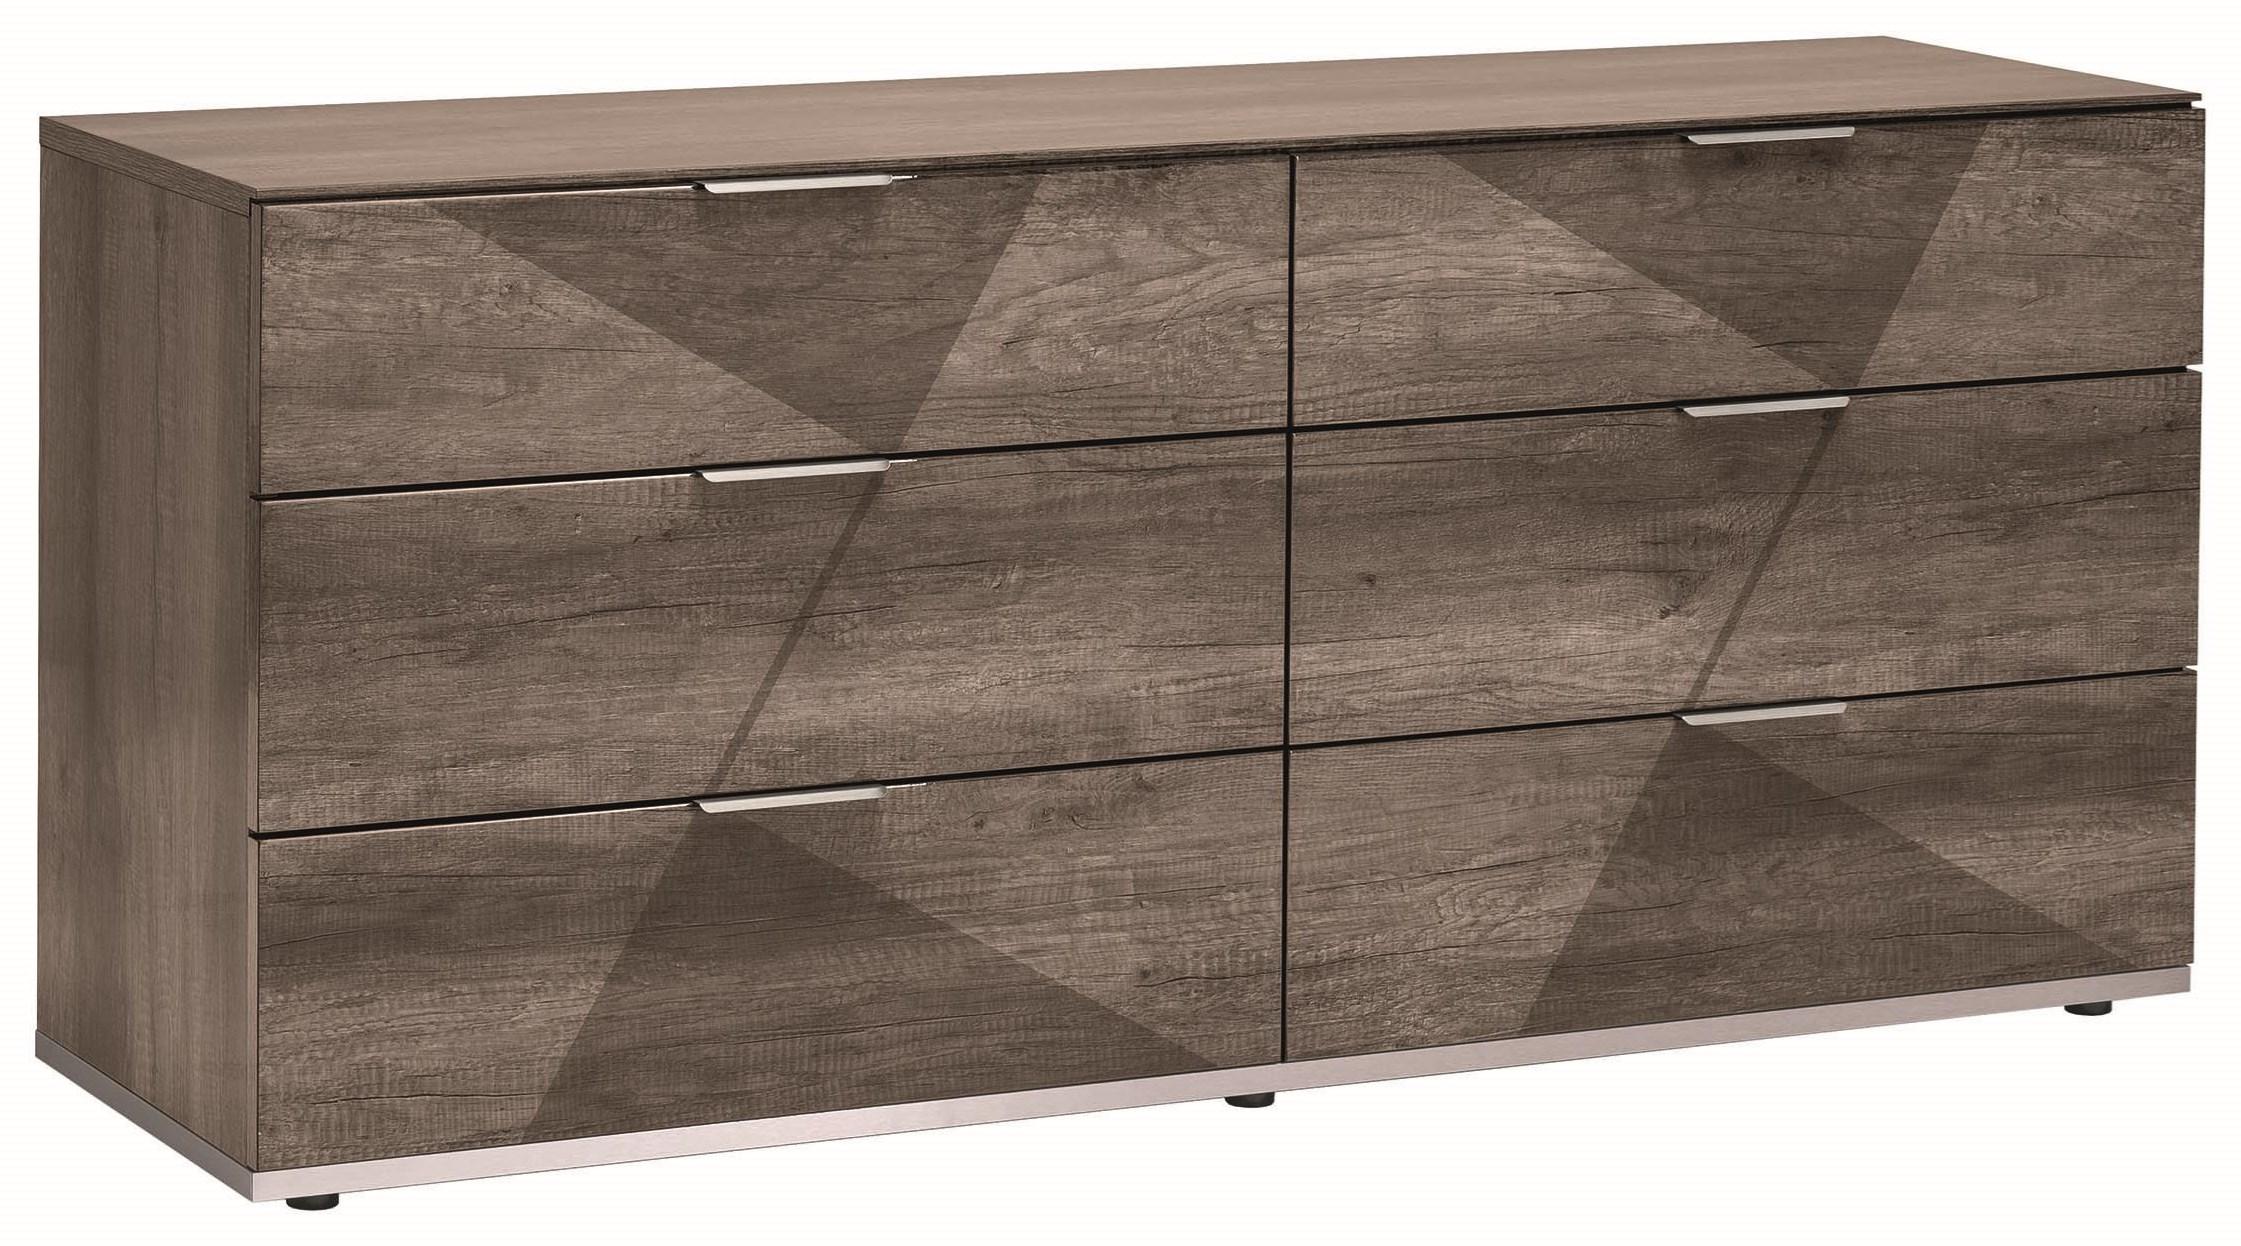 Favignana 6 Drawer Dresser by Alf Italia at HomeWorld Furniture